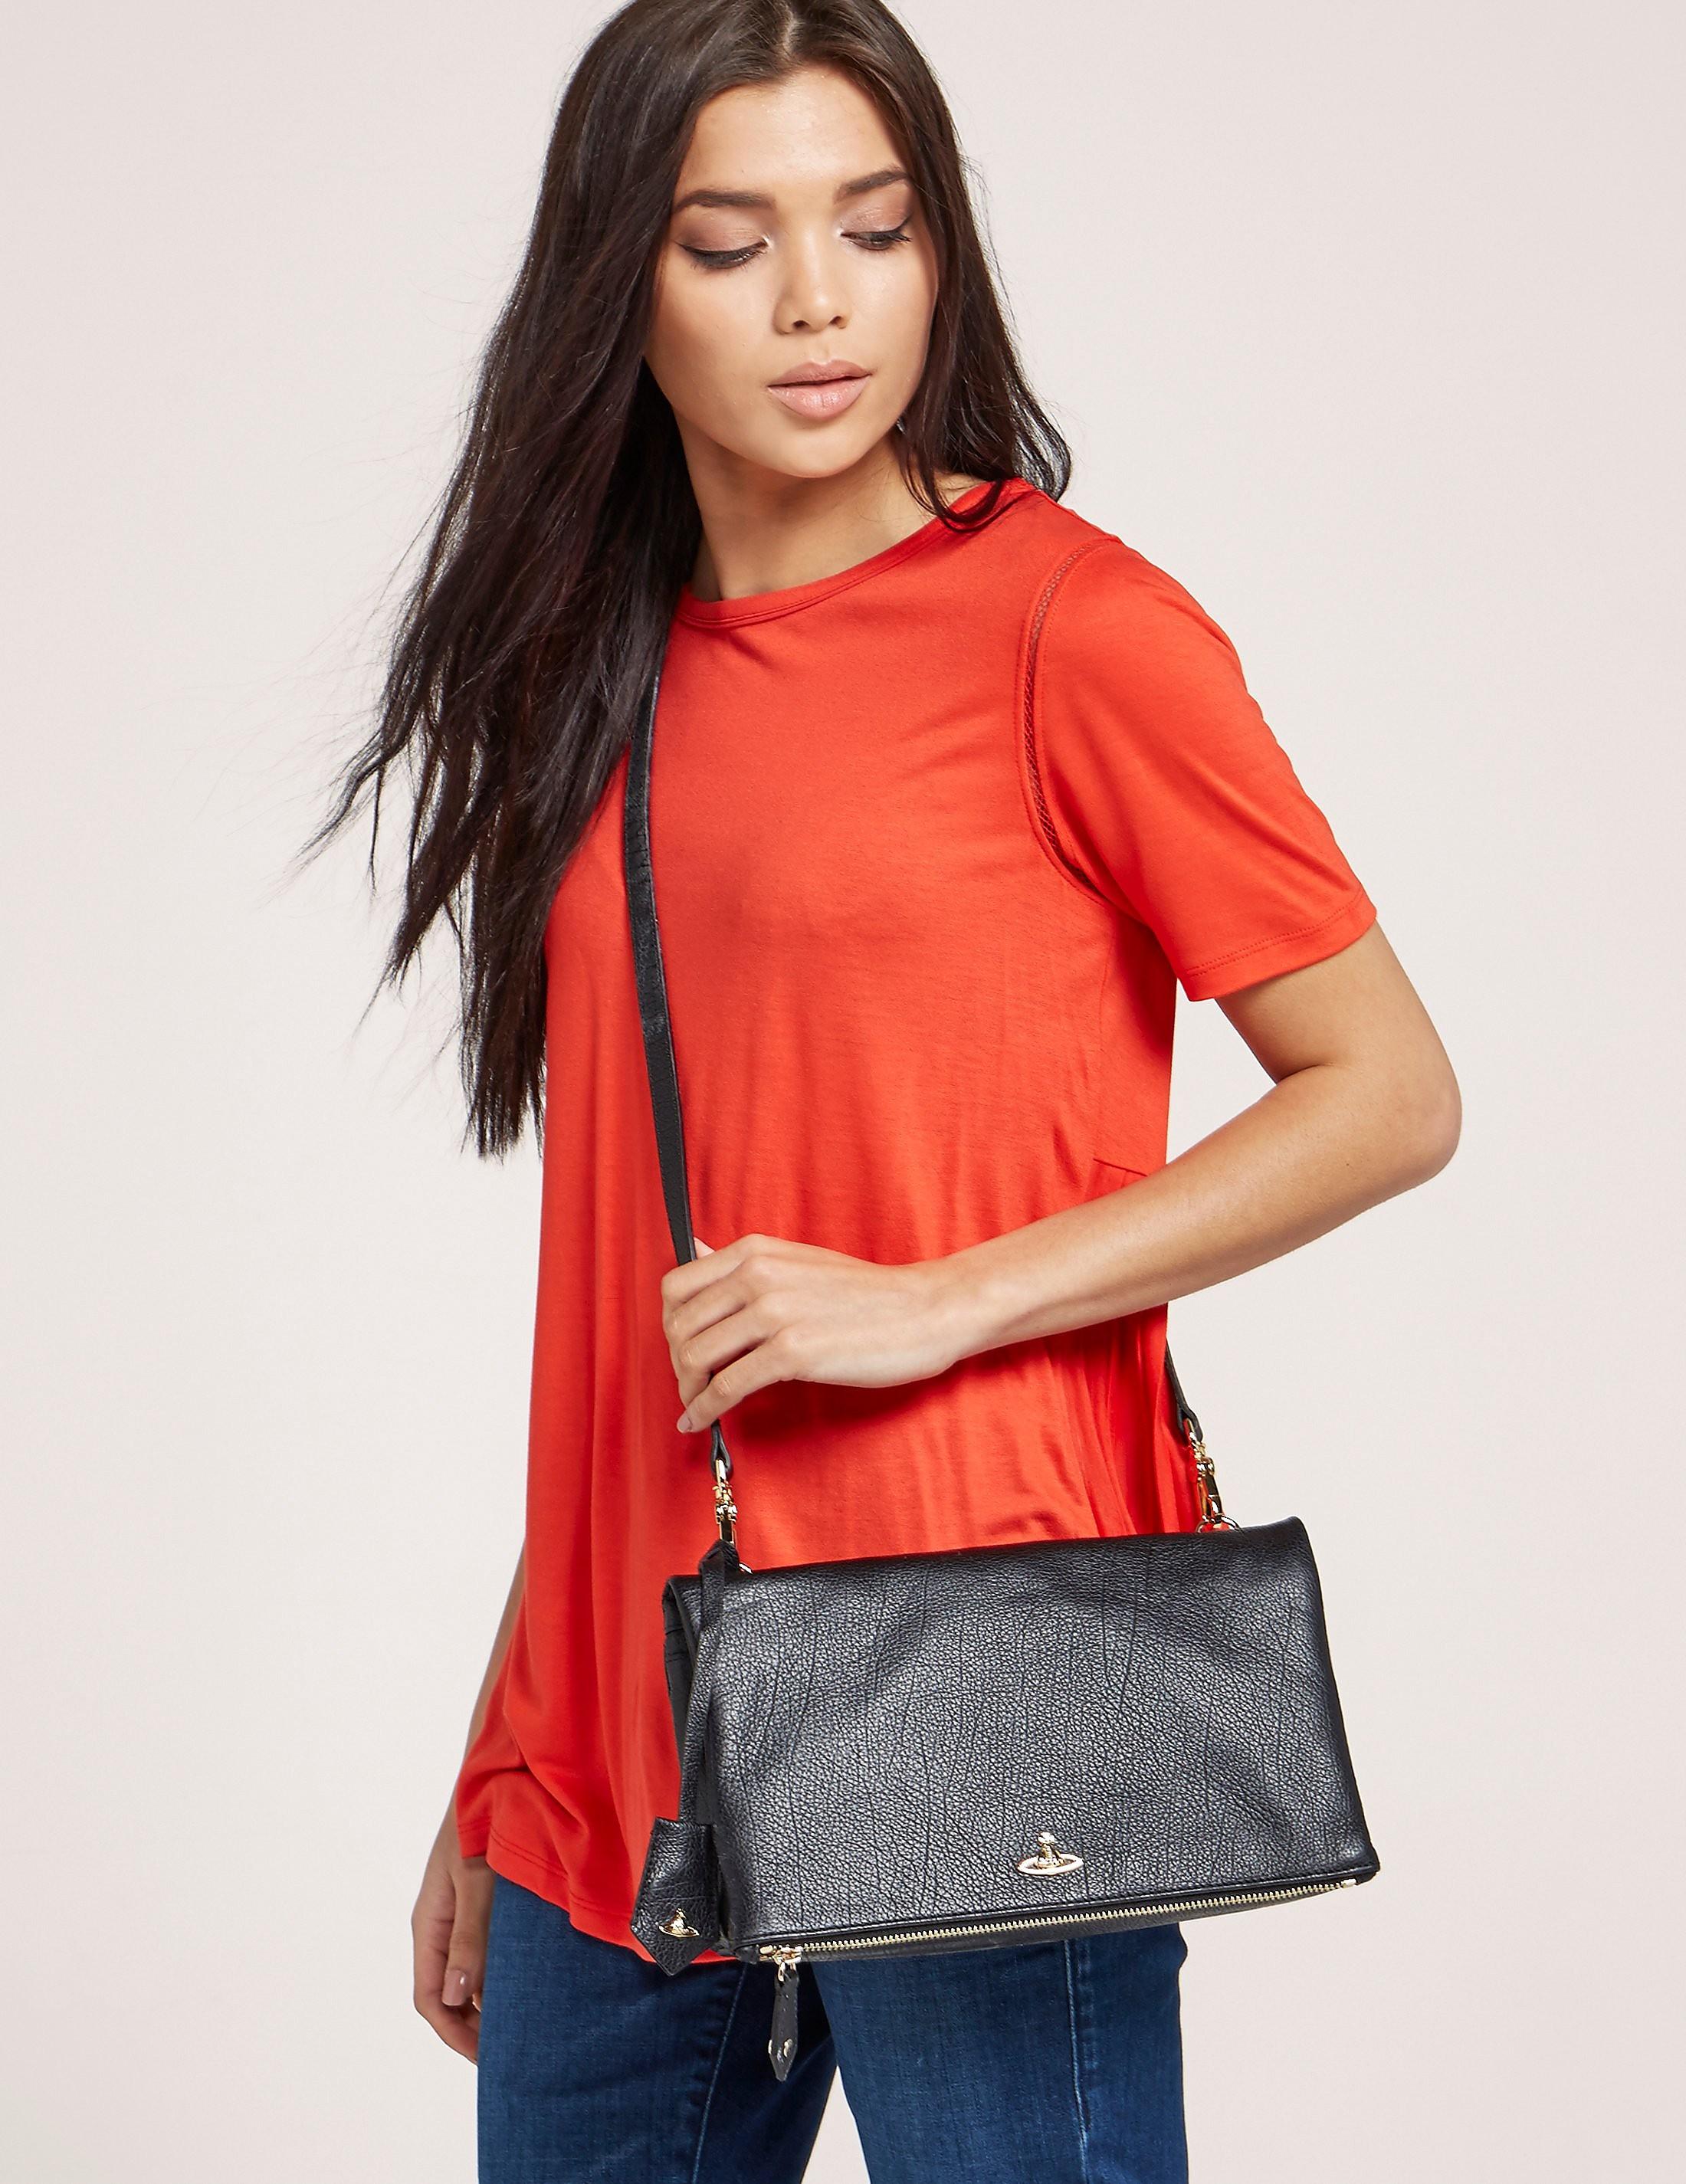 Vivienne Westwood Balmoral Crossbody Bag